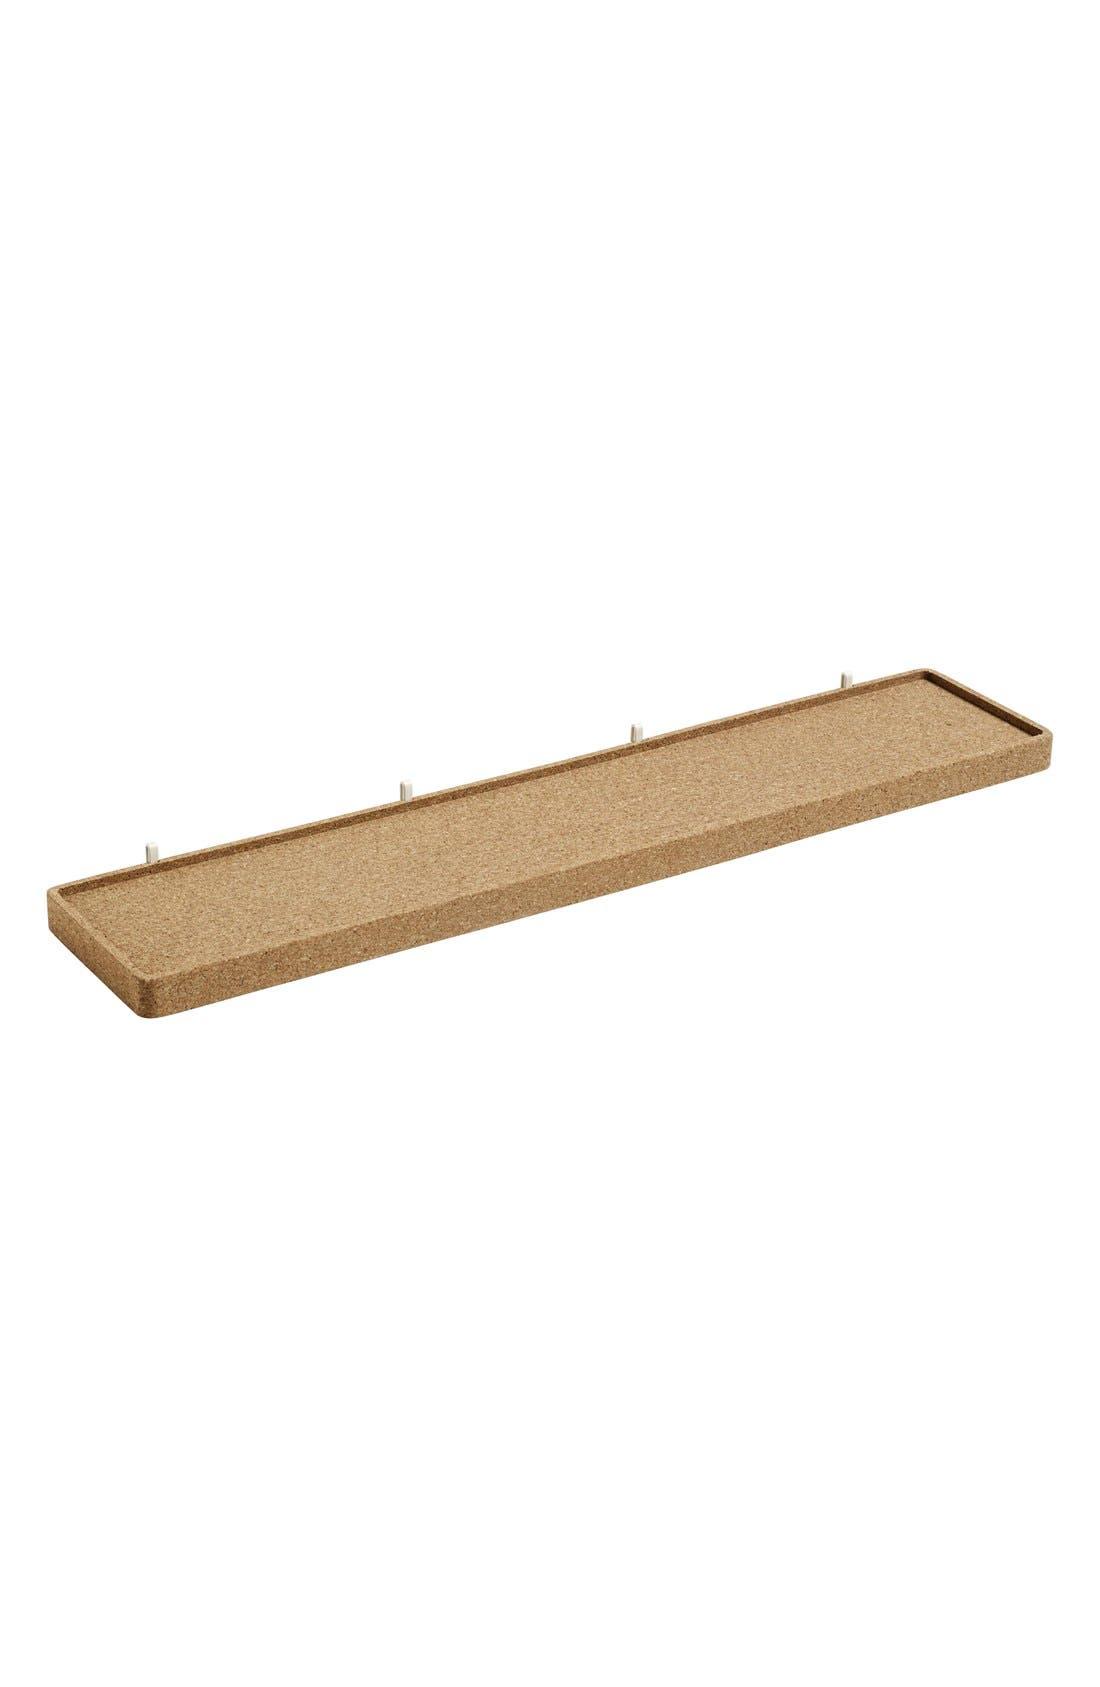 Alternate Image 1 Selected - HAY 'Pinorama - Large' Cork Shelf